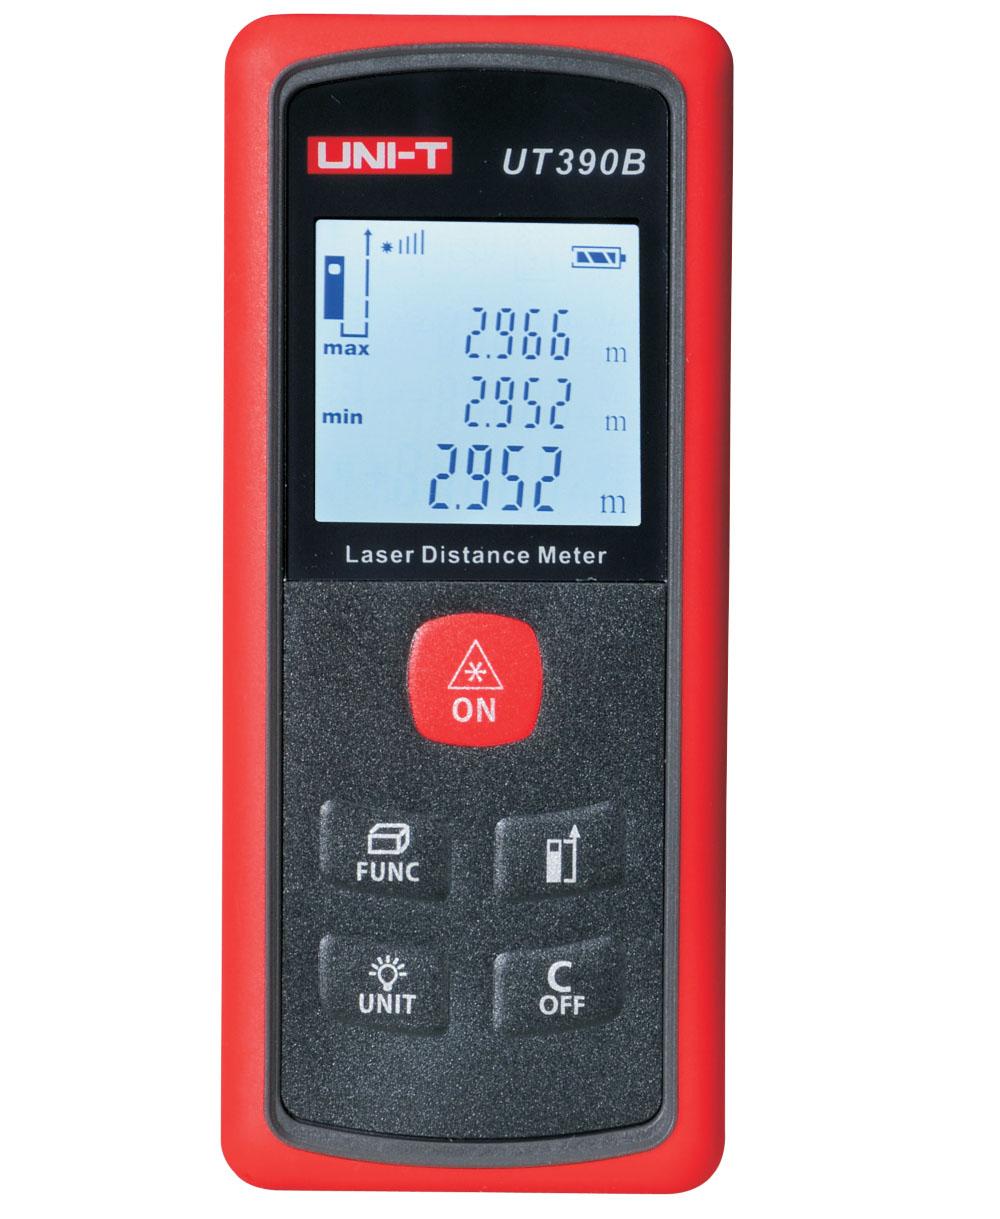 UNI-T UT390B+ - Laser Distance Meter Range: 40M